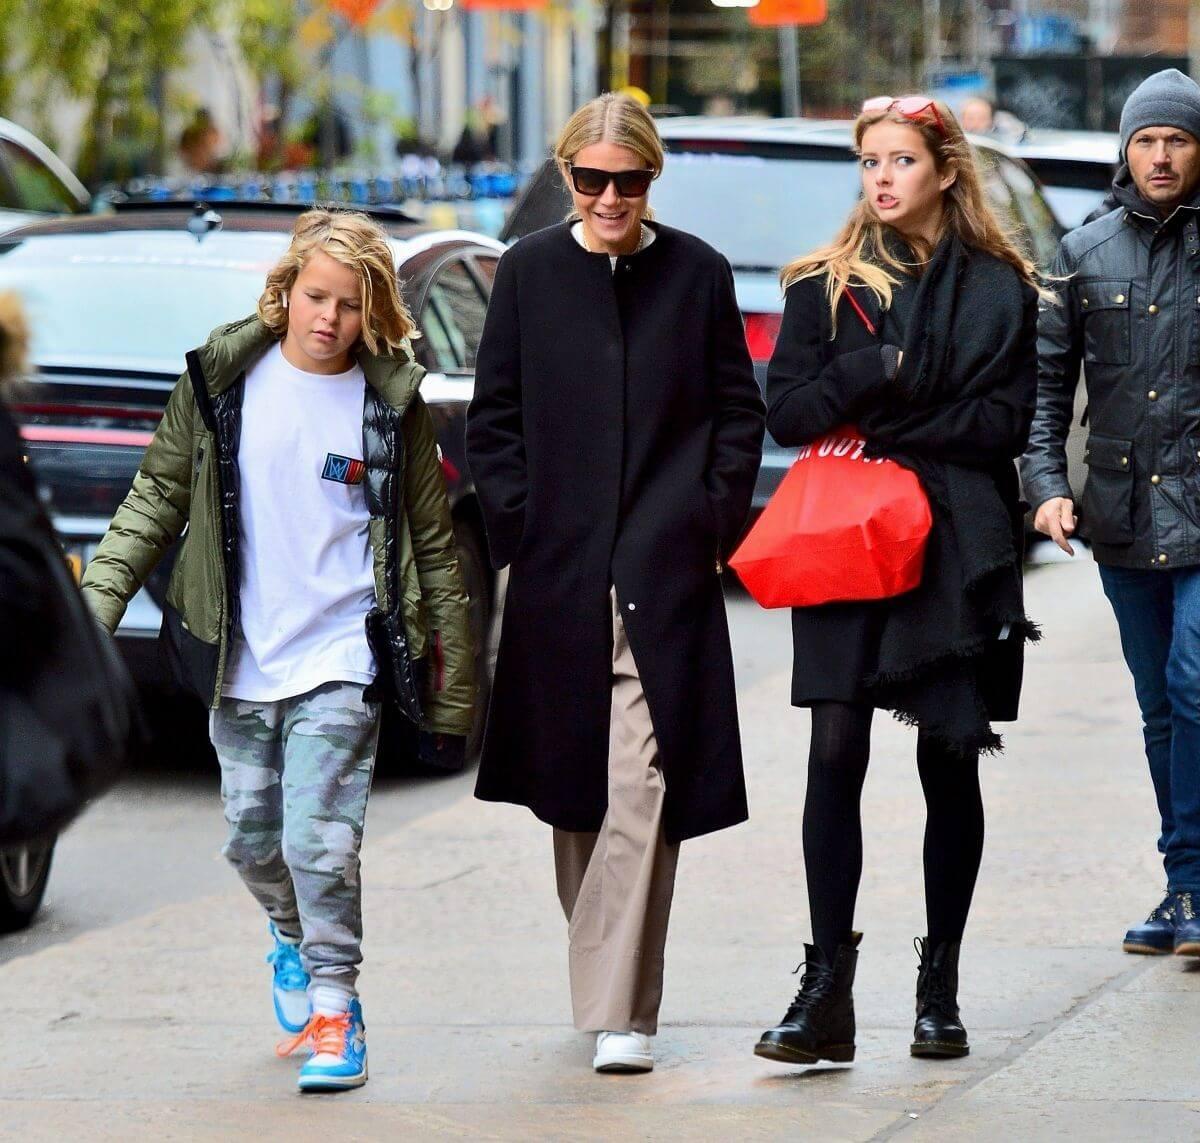 Gwyneth Paltrow Kids, Husband, Wedding, Net Worth, Age, Mom, Height, Daughter, Birthday, Photos, Goop, Instagram, Imdb, Website, Awards, Youtube, Biography, Twitter, Wiki, Facebook, Linkedin ( (41)